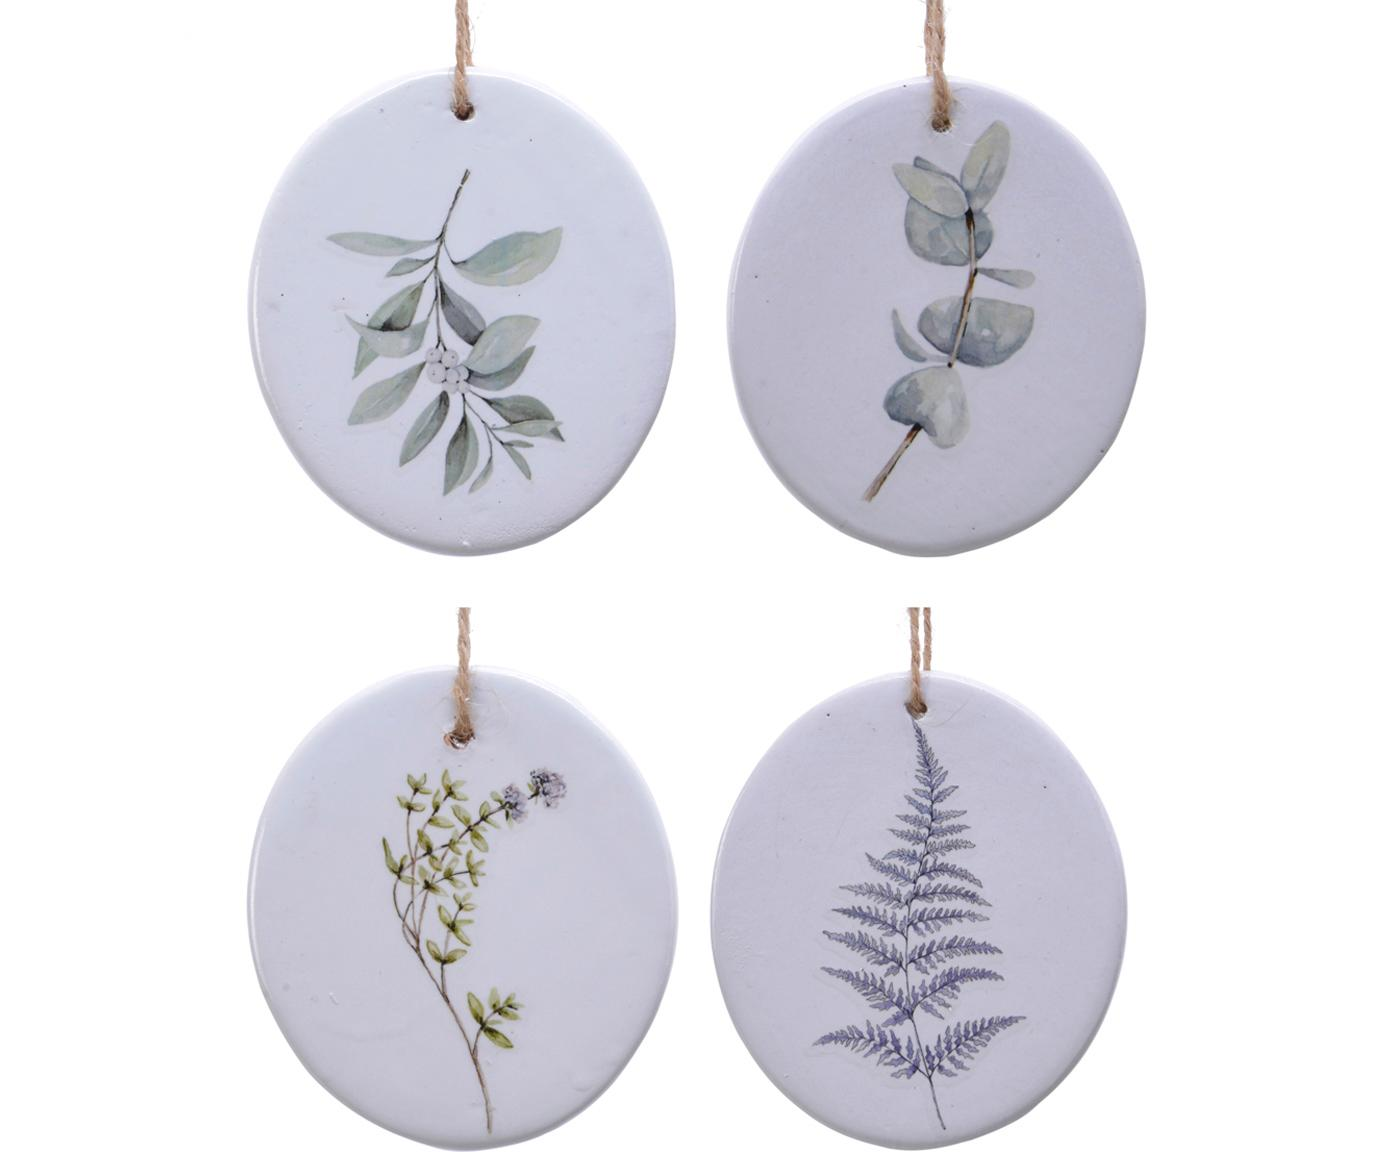 Kerstboomhangersset Flory, 4-delig, Porselein, Wit, groen, Ø 8 cm